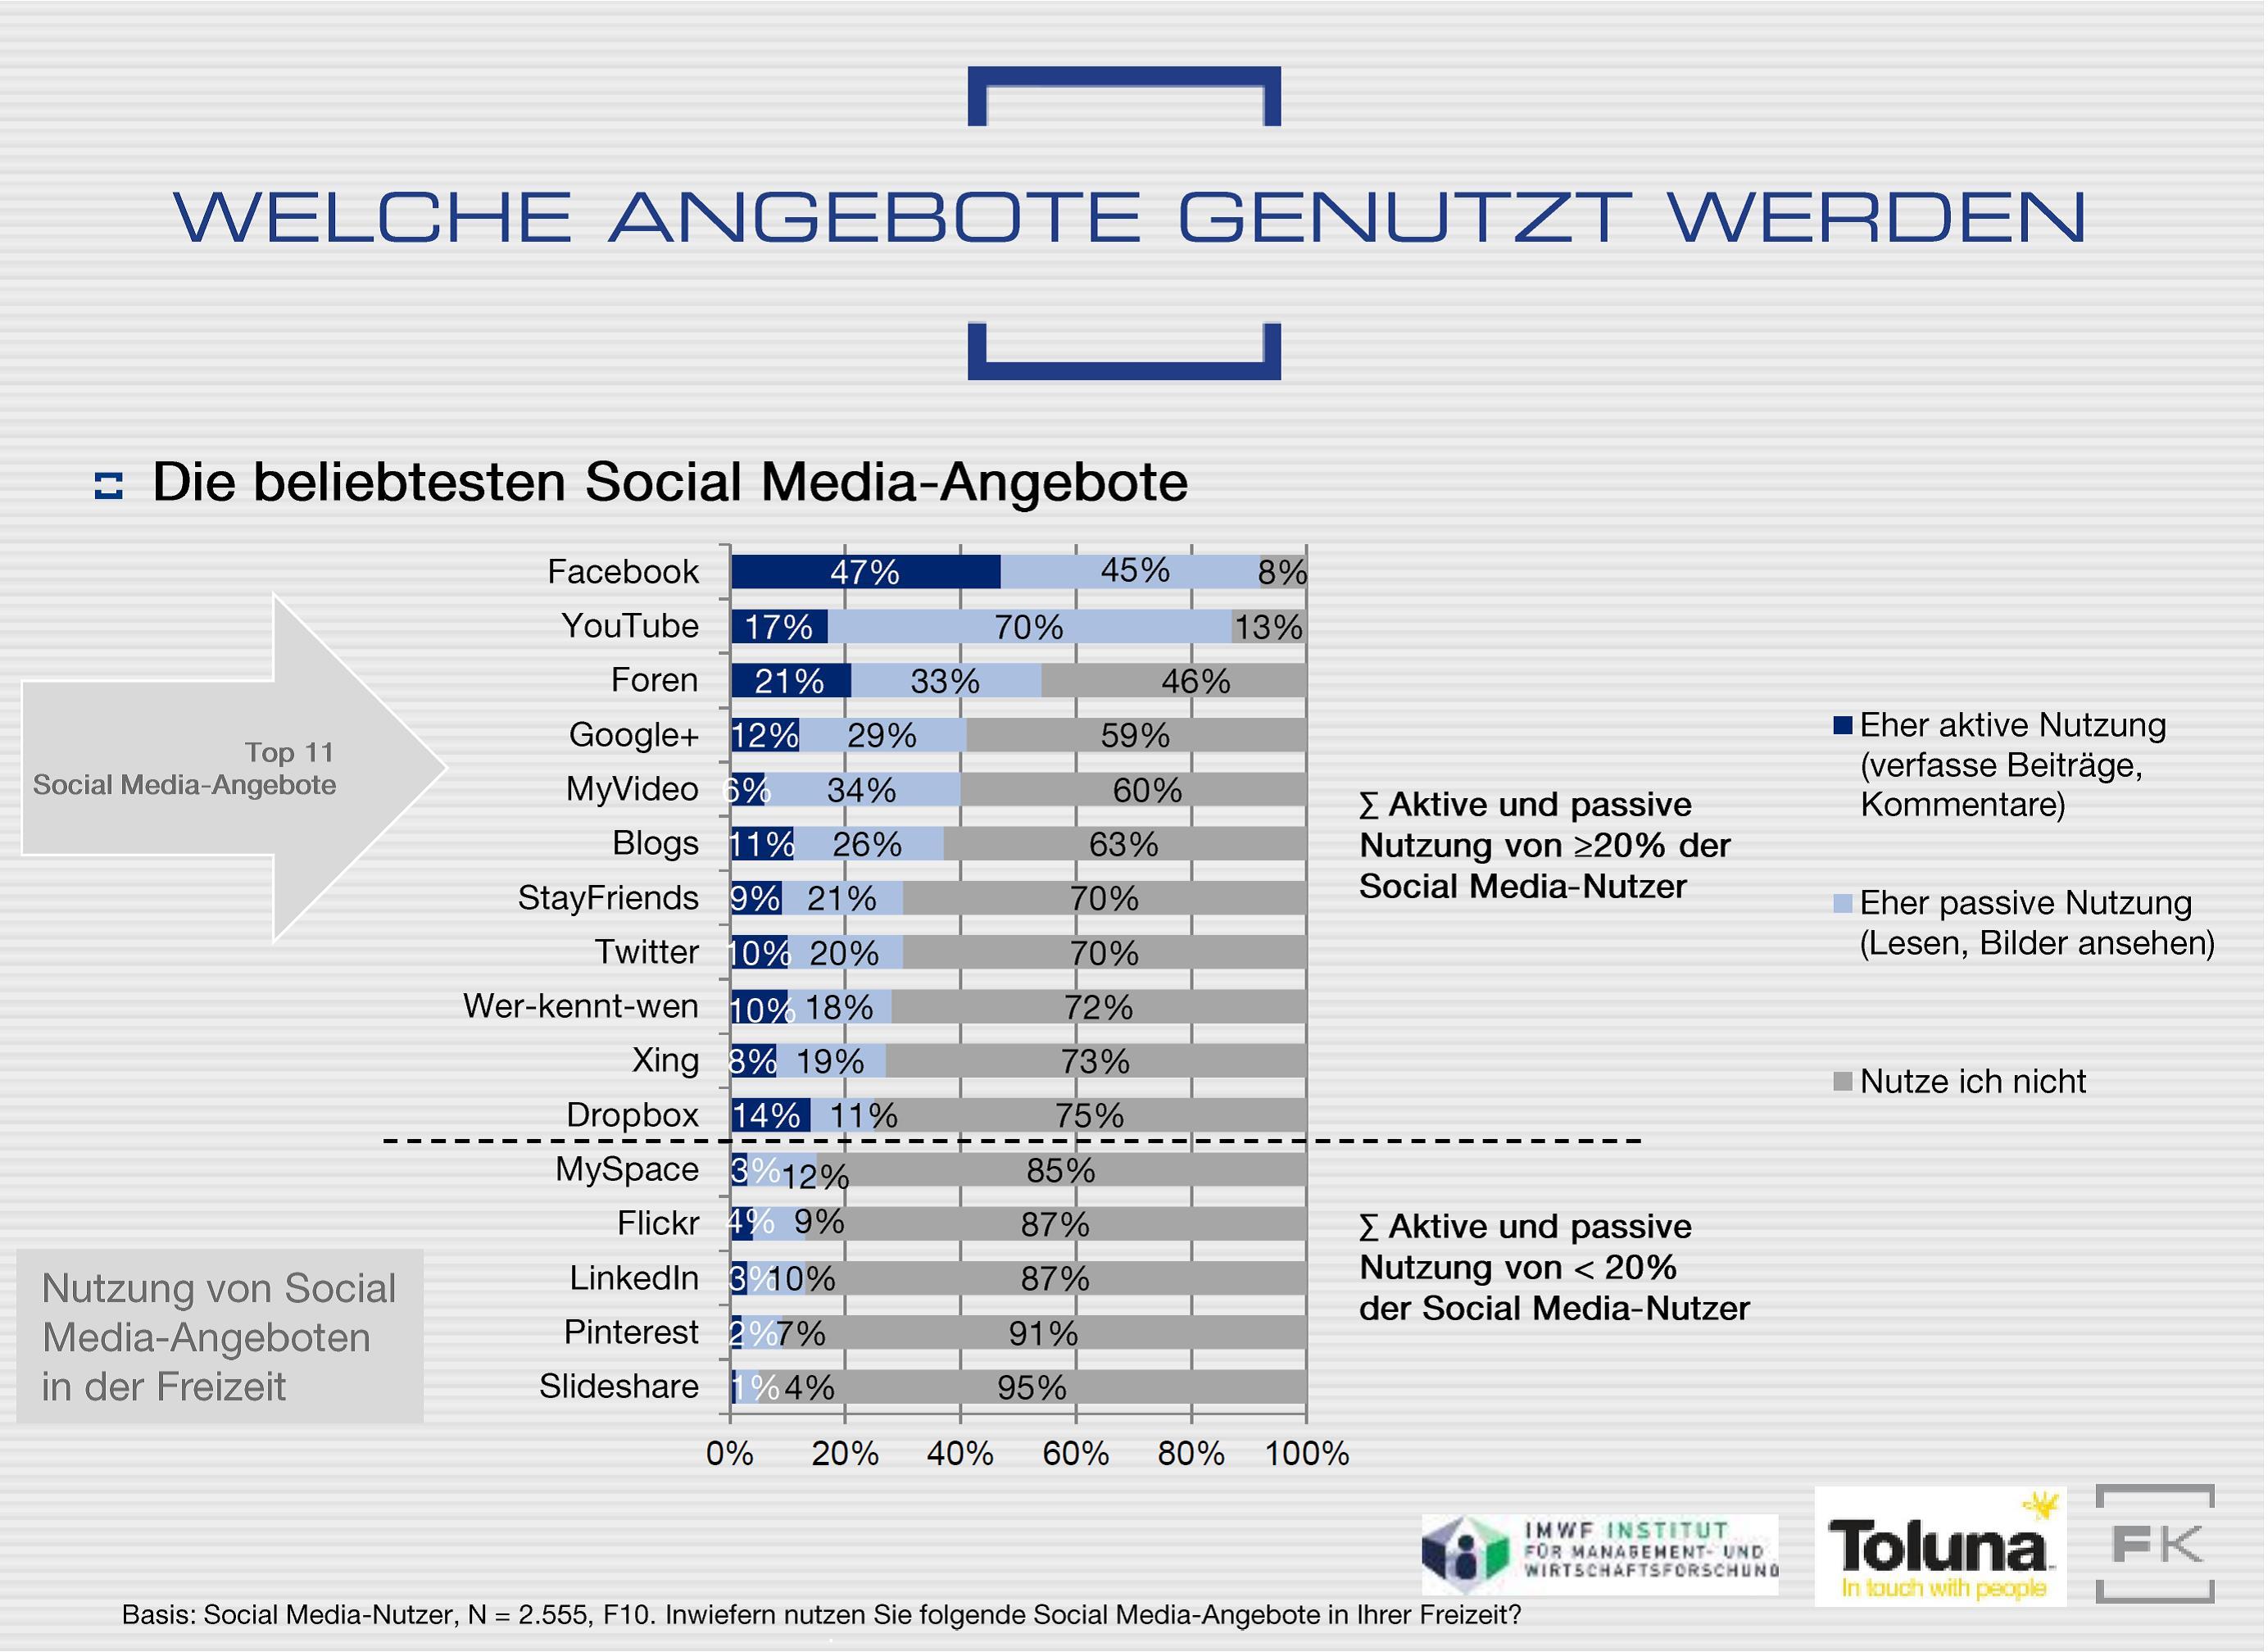 Social Media-Atlas 2013 Grafik Soziale Medien Freizeitnutzung - Facebook führt